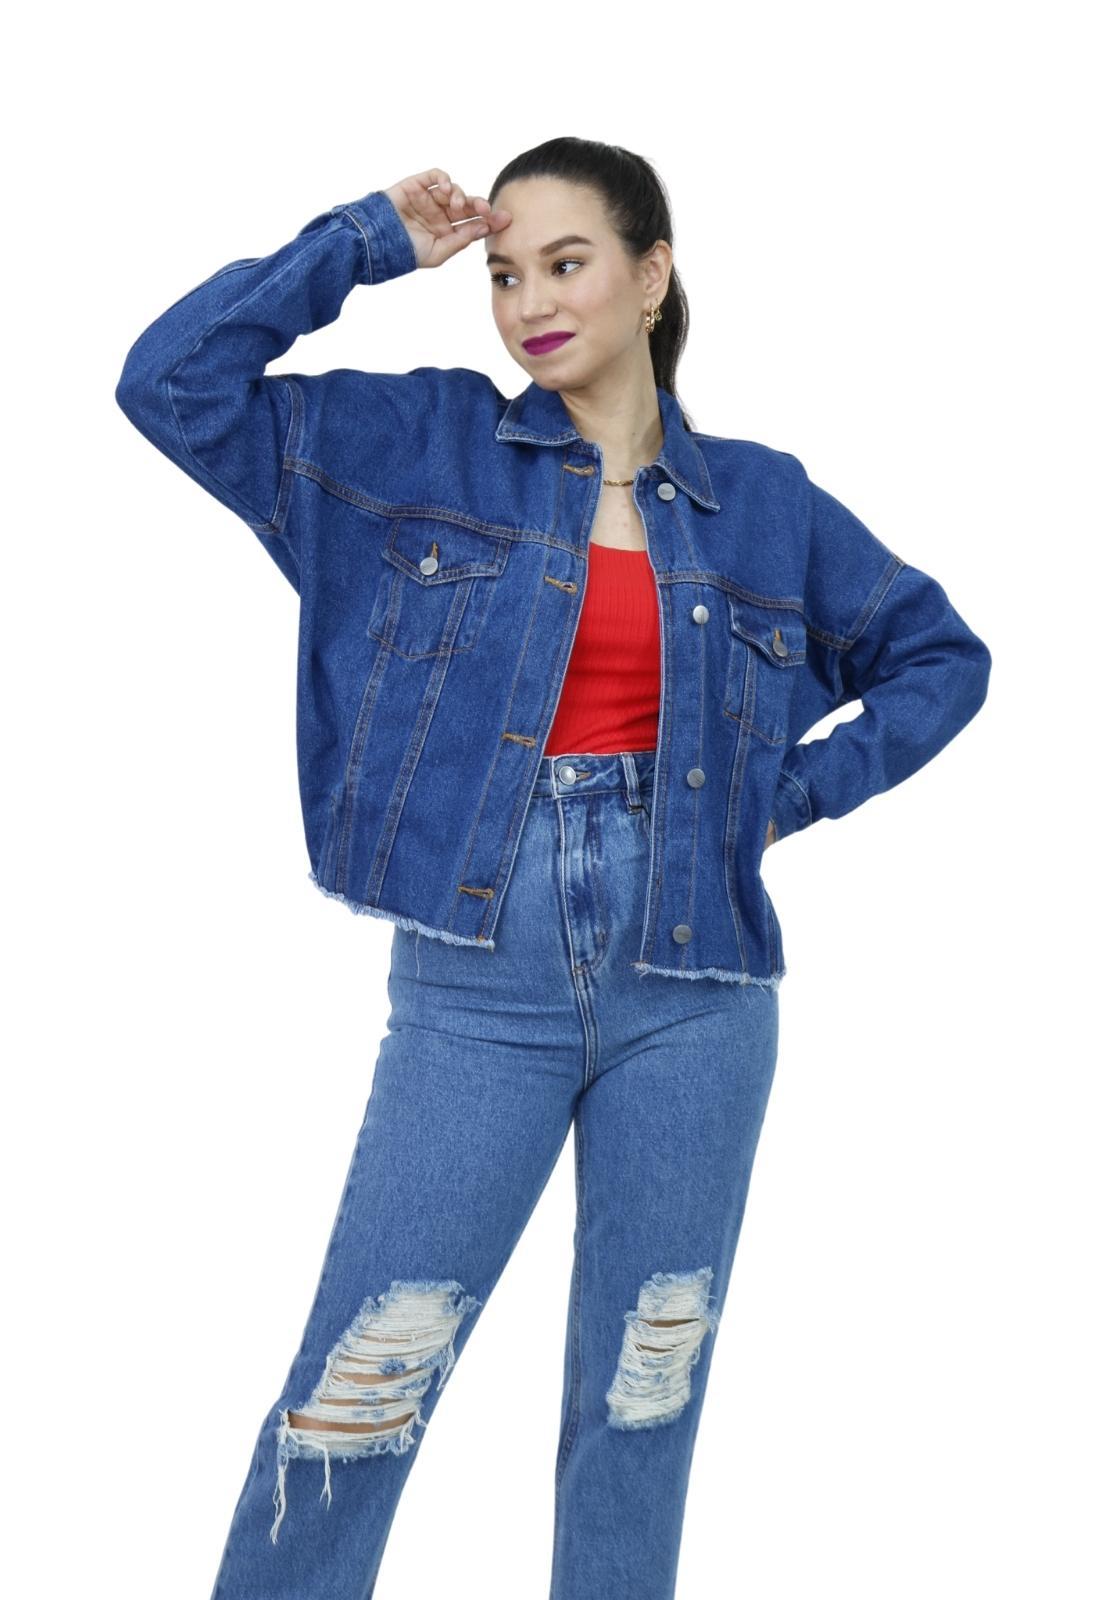 Jaqueta Feminina Jeans Escuro Ampla Elástico